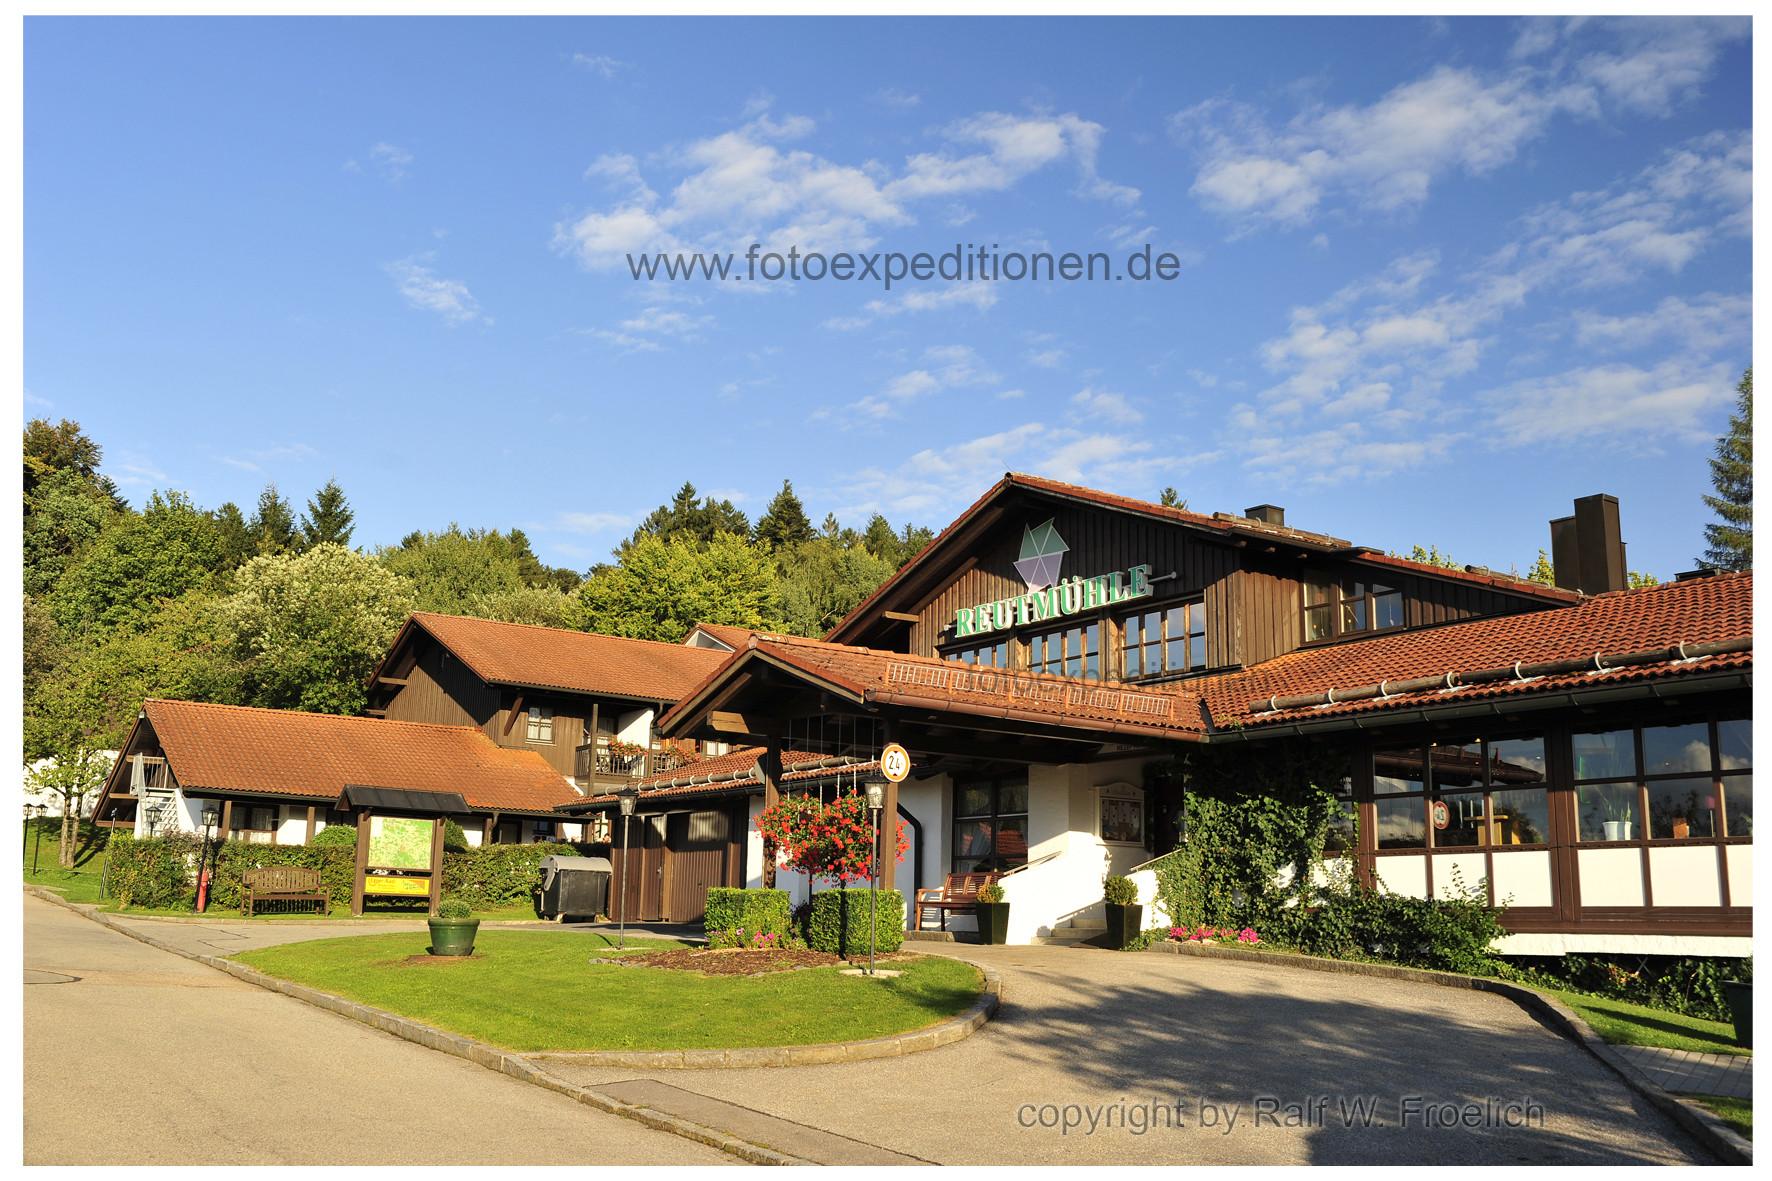 Hotel Reuthmühle, Waldkirchen, Germany